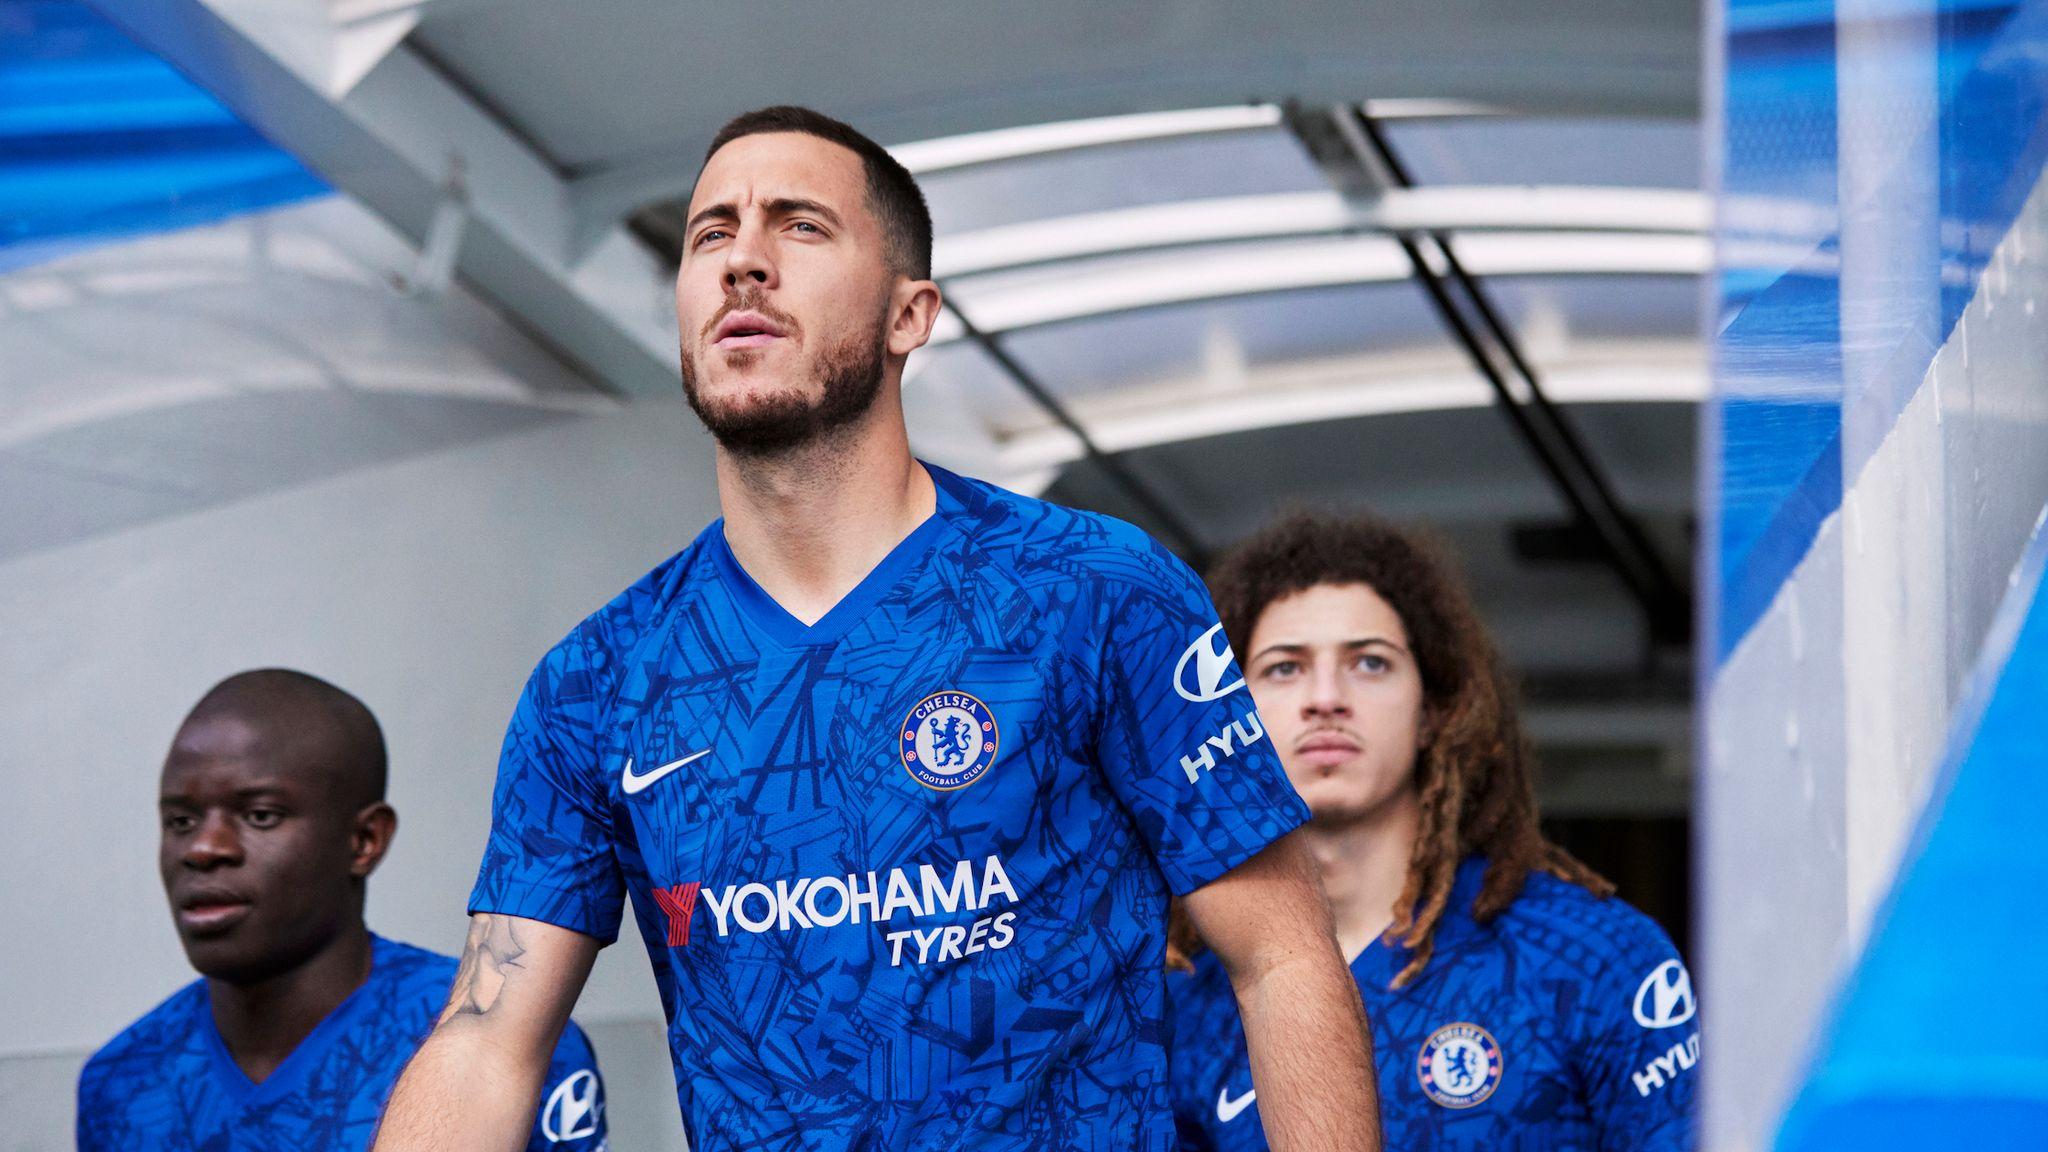 c0ee1a270 New Premier League kits for the 2019 20 season